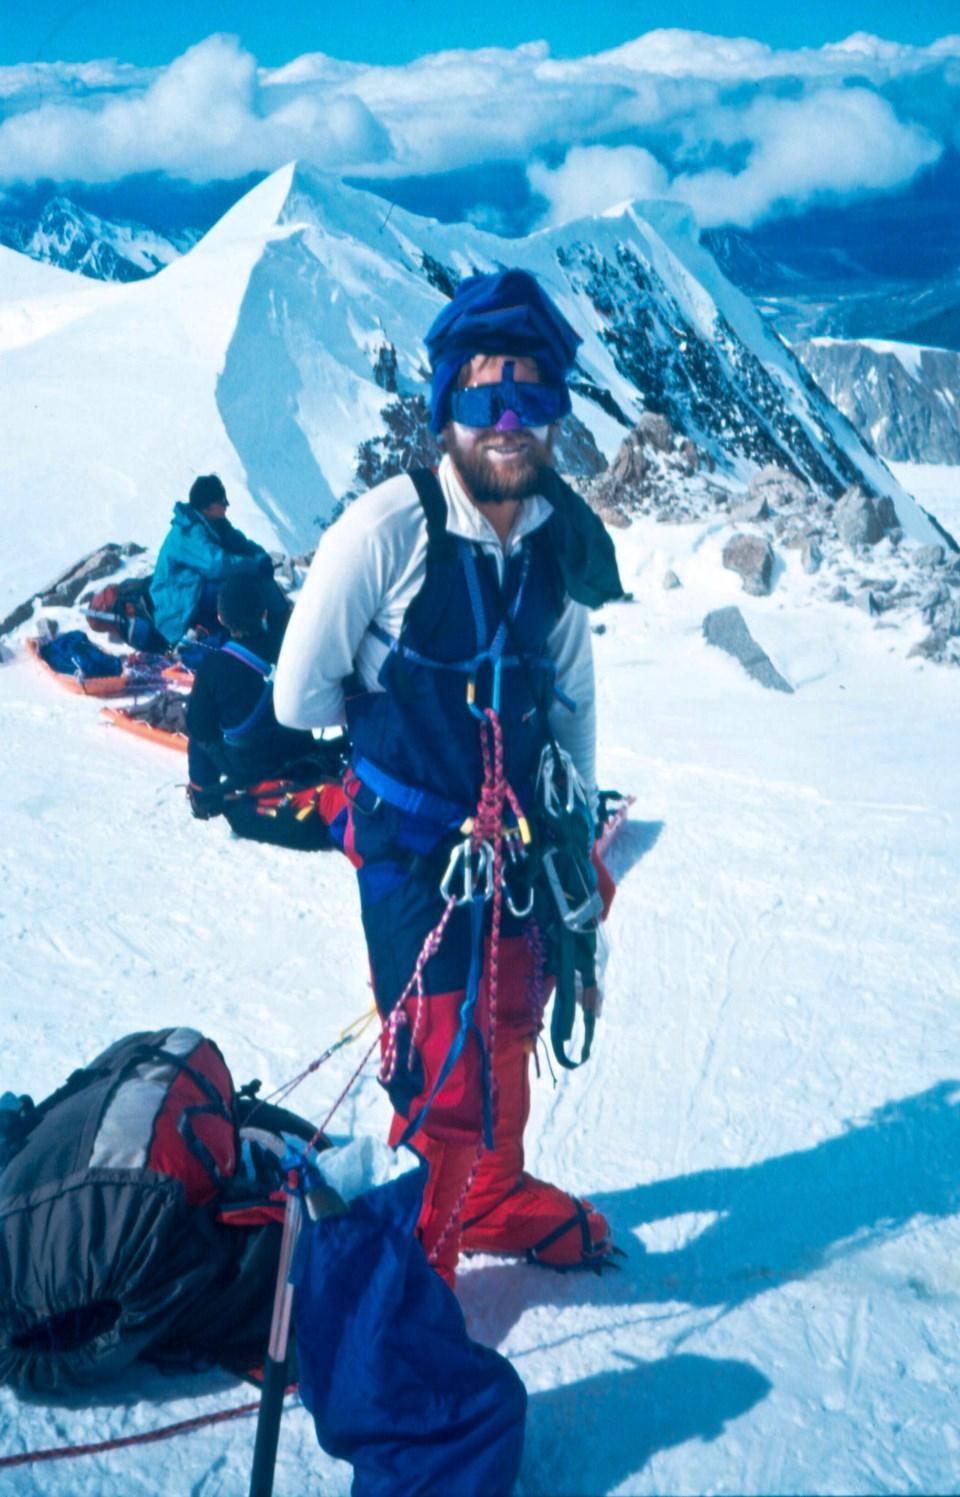 Chapman, 29, climbing Denali in Alaska